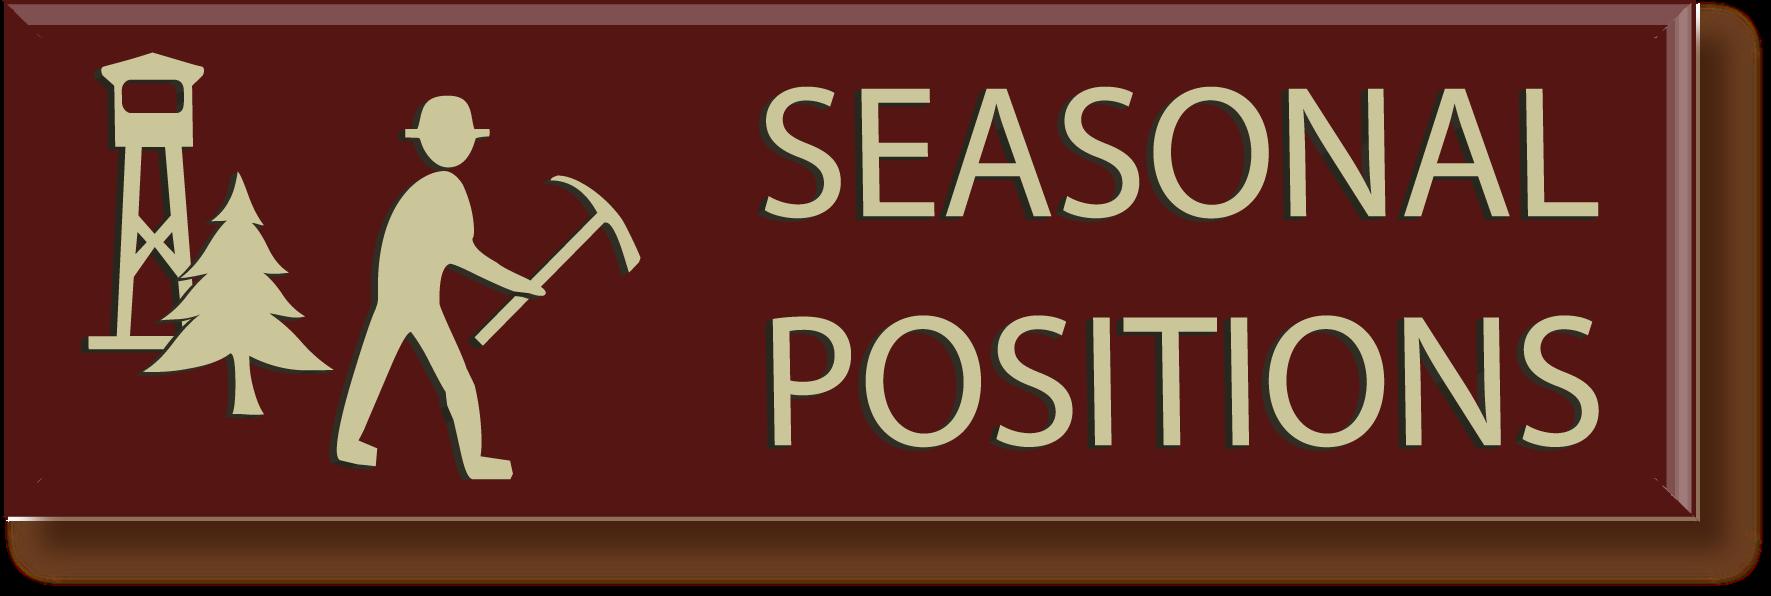 Seasonal Positions